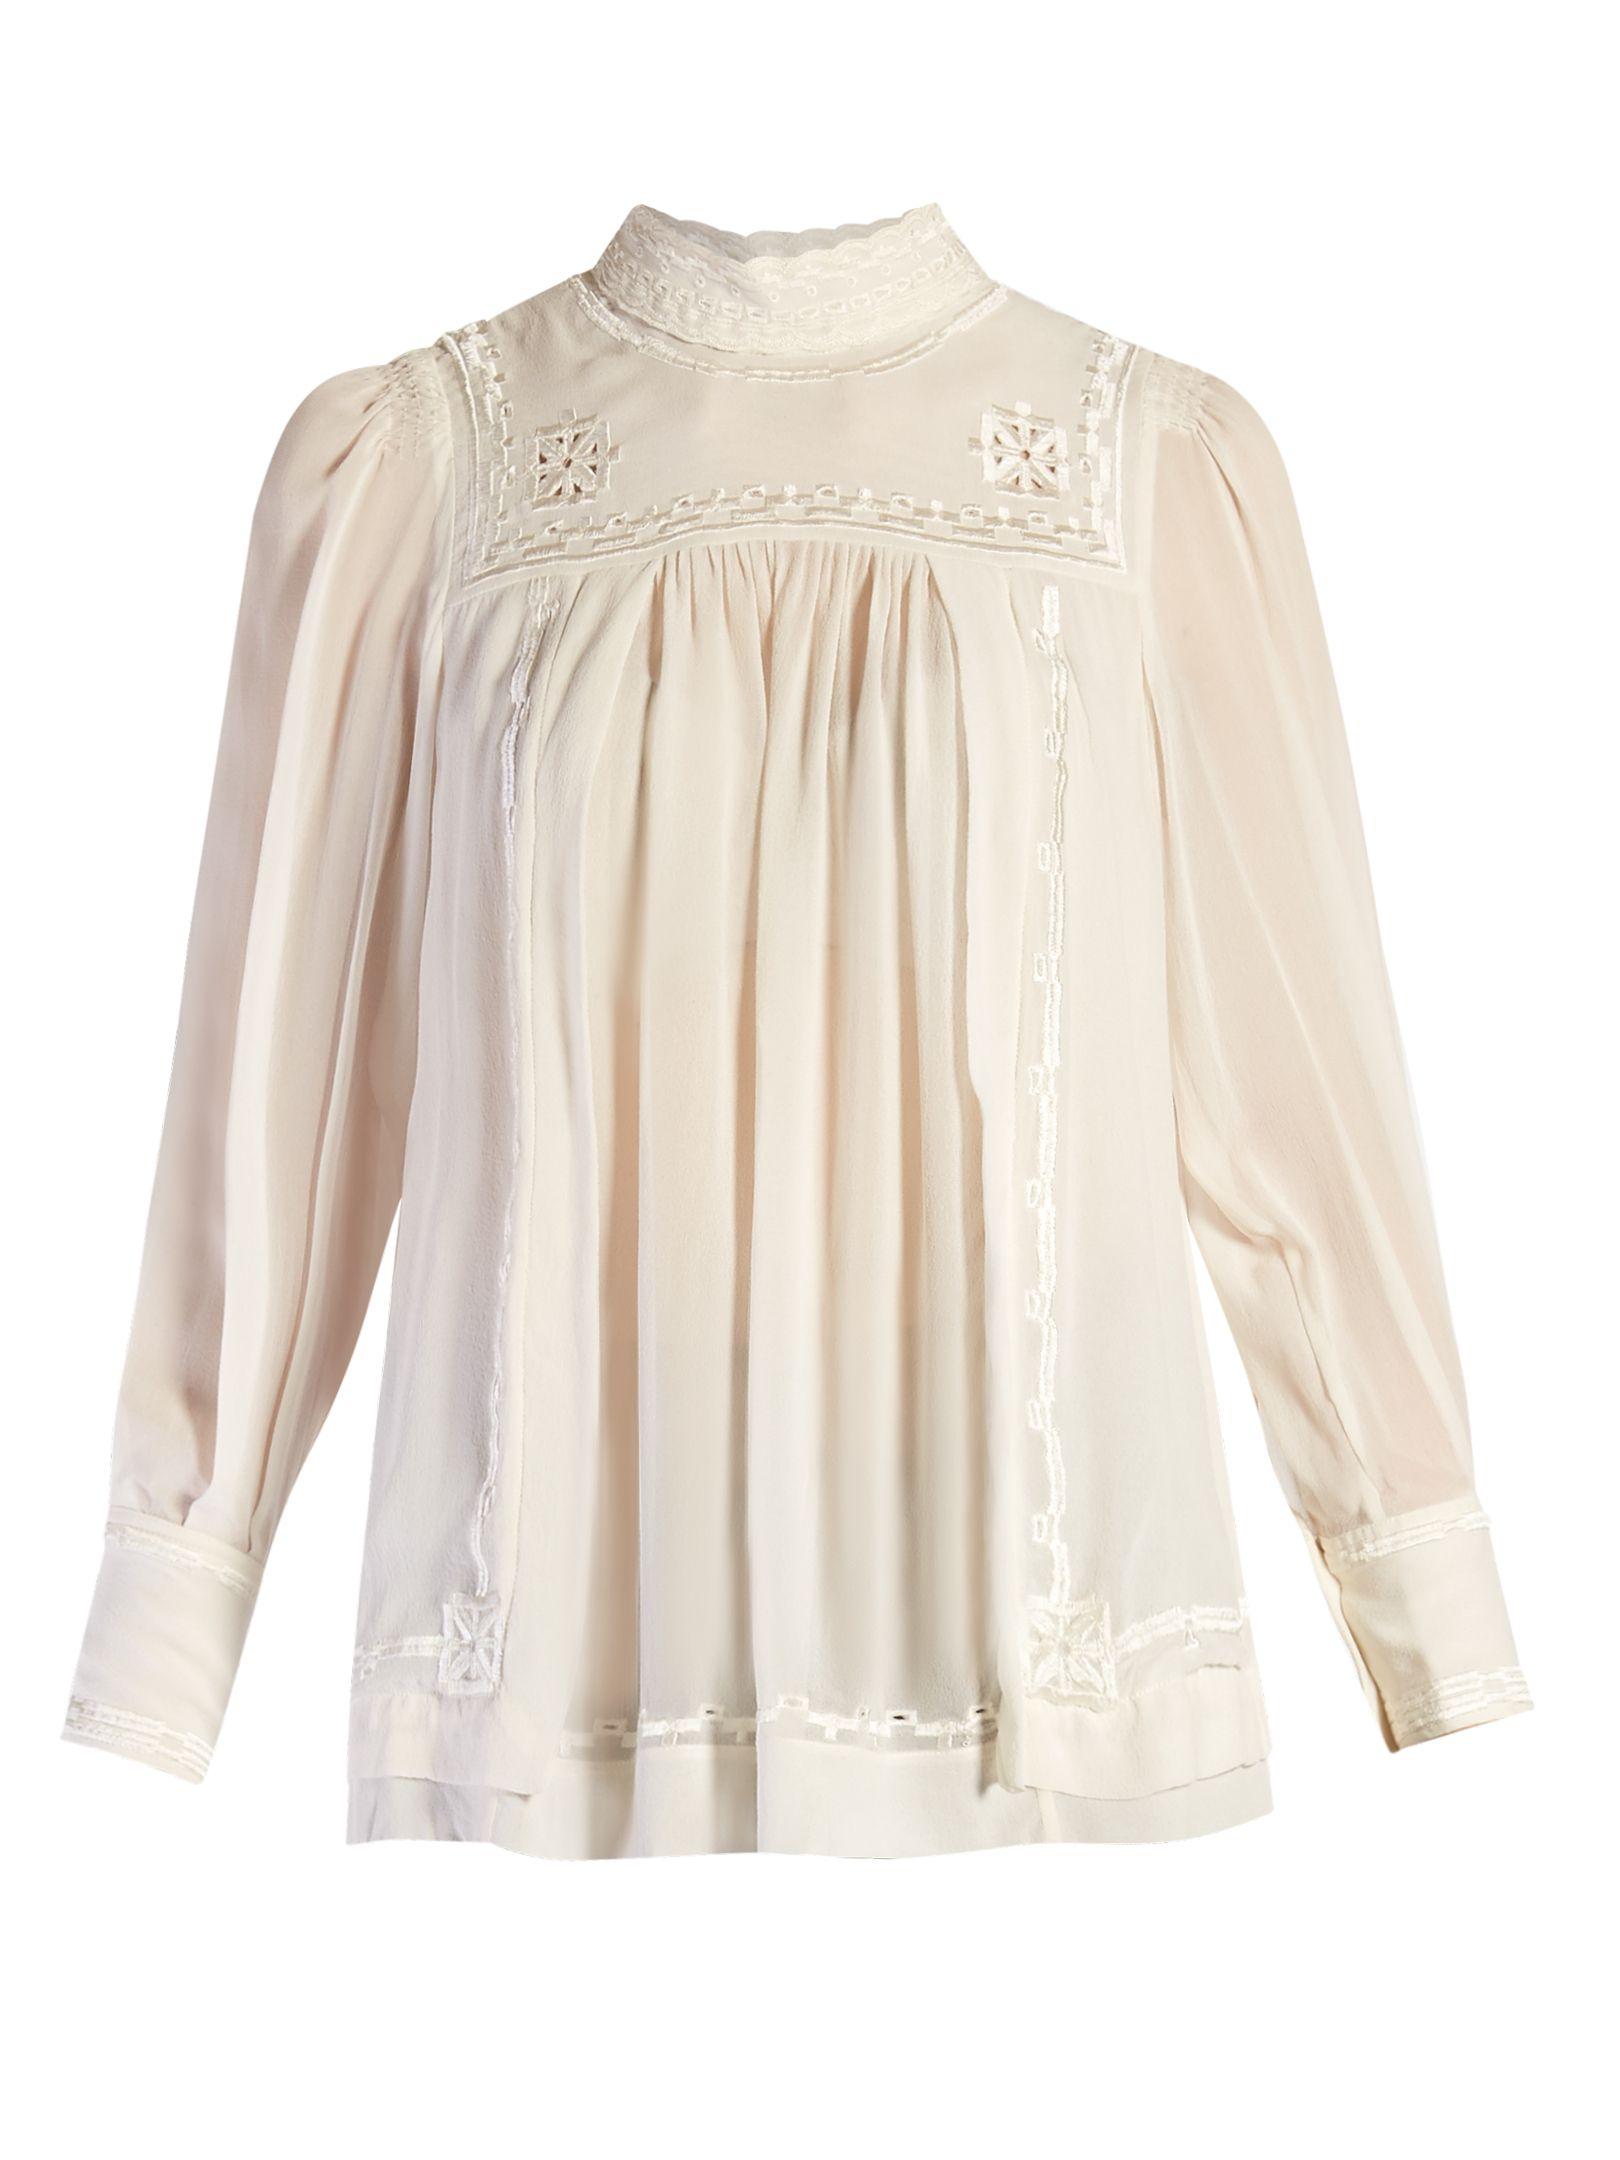 Maeva high-neck embroidered blouse | Isabel Marant